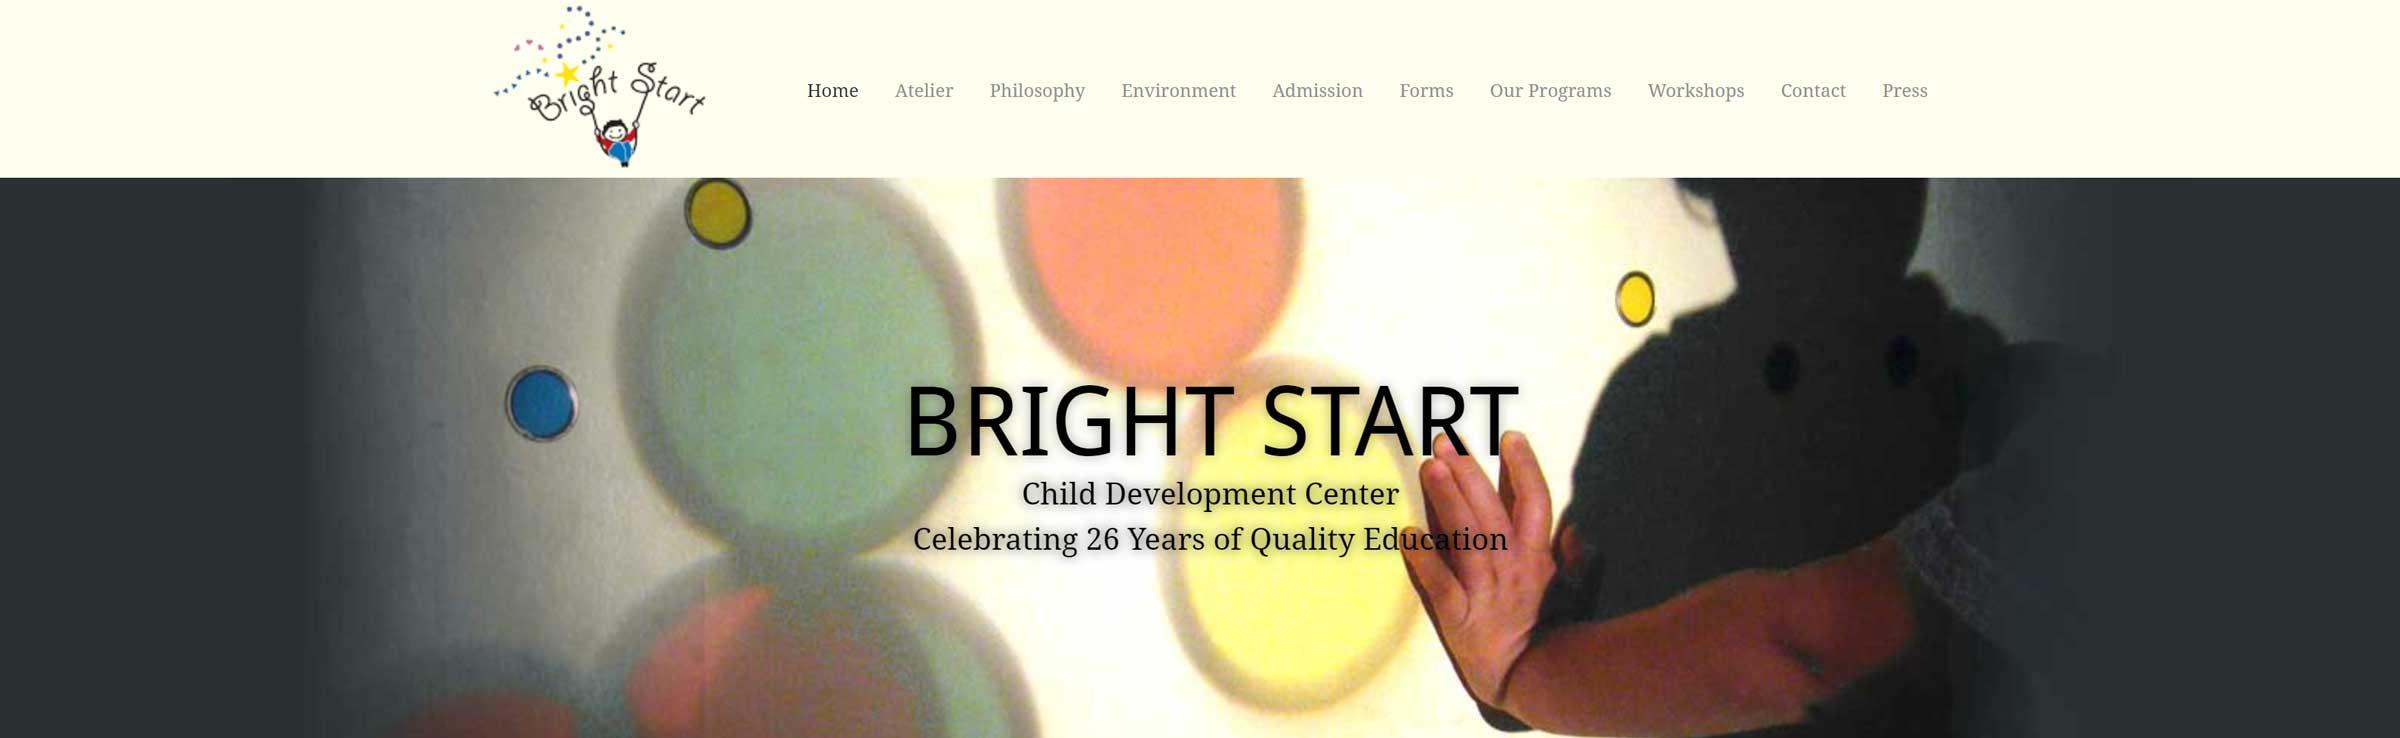 Bright Start banner